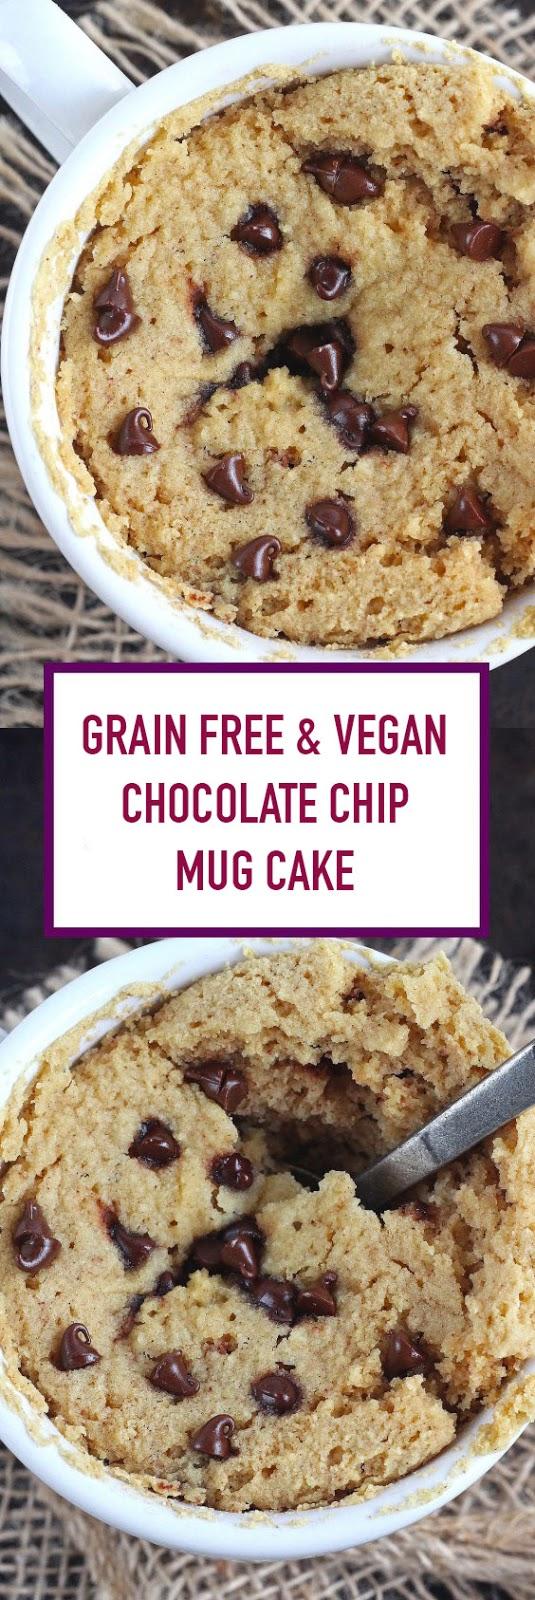 Grain Free & Vegan Chocolate Chip Mug Cake